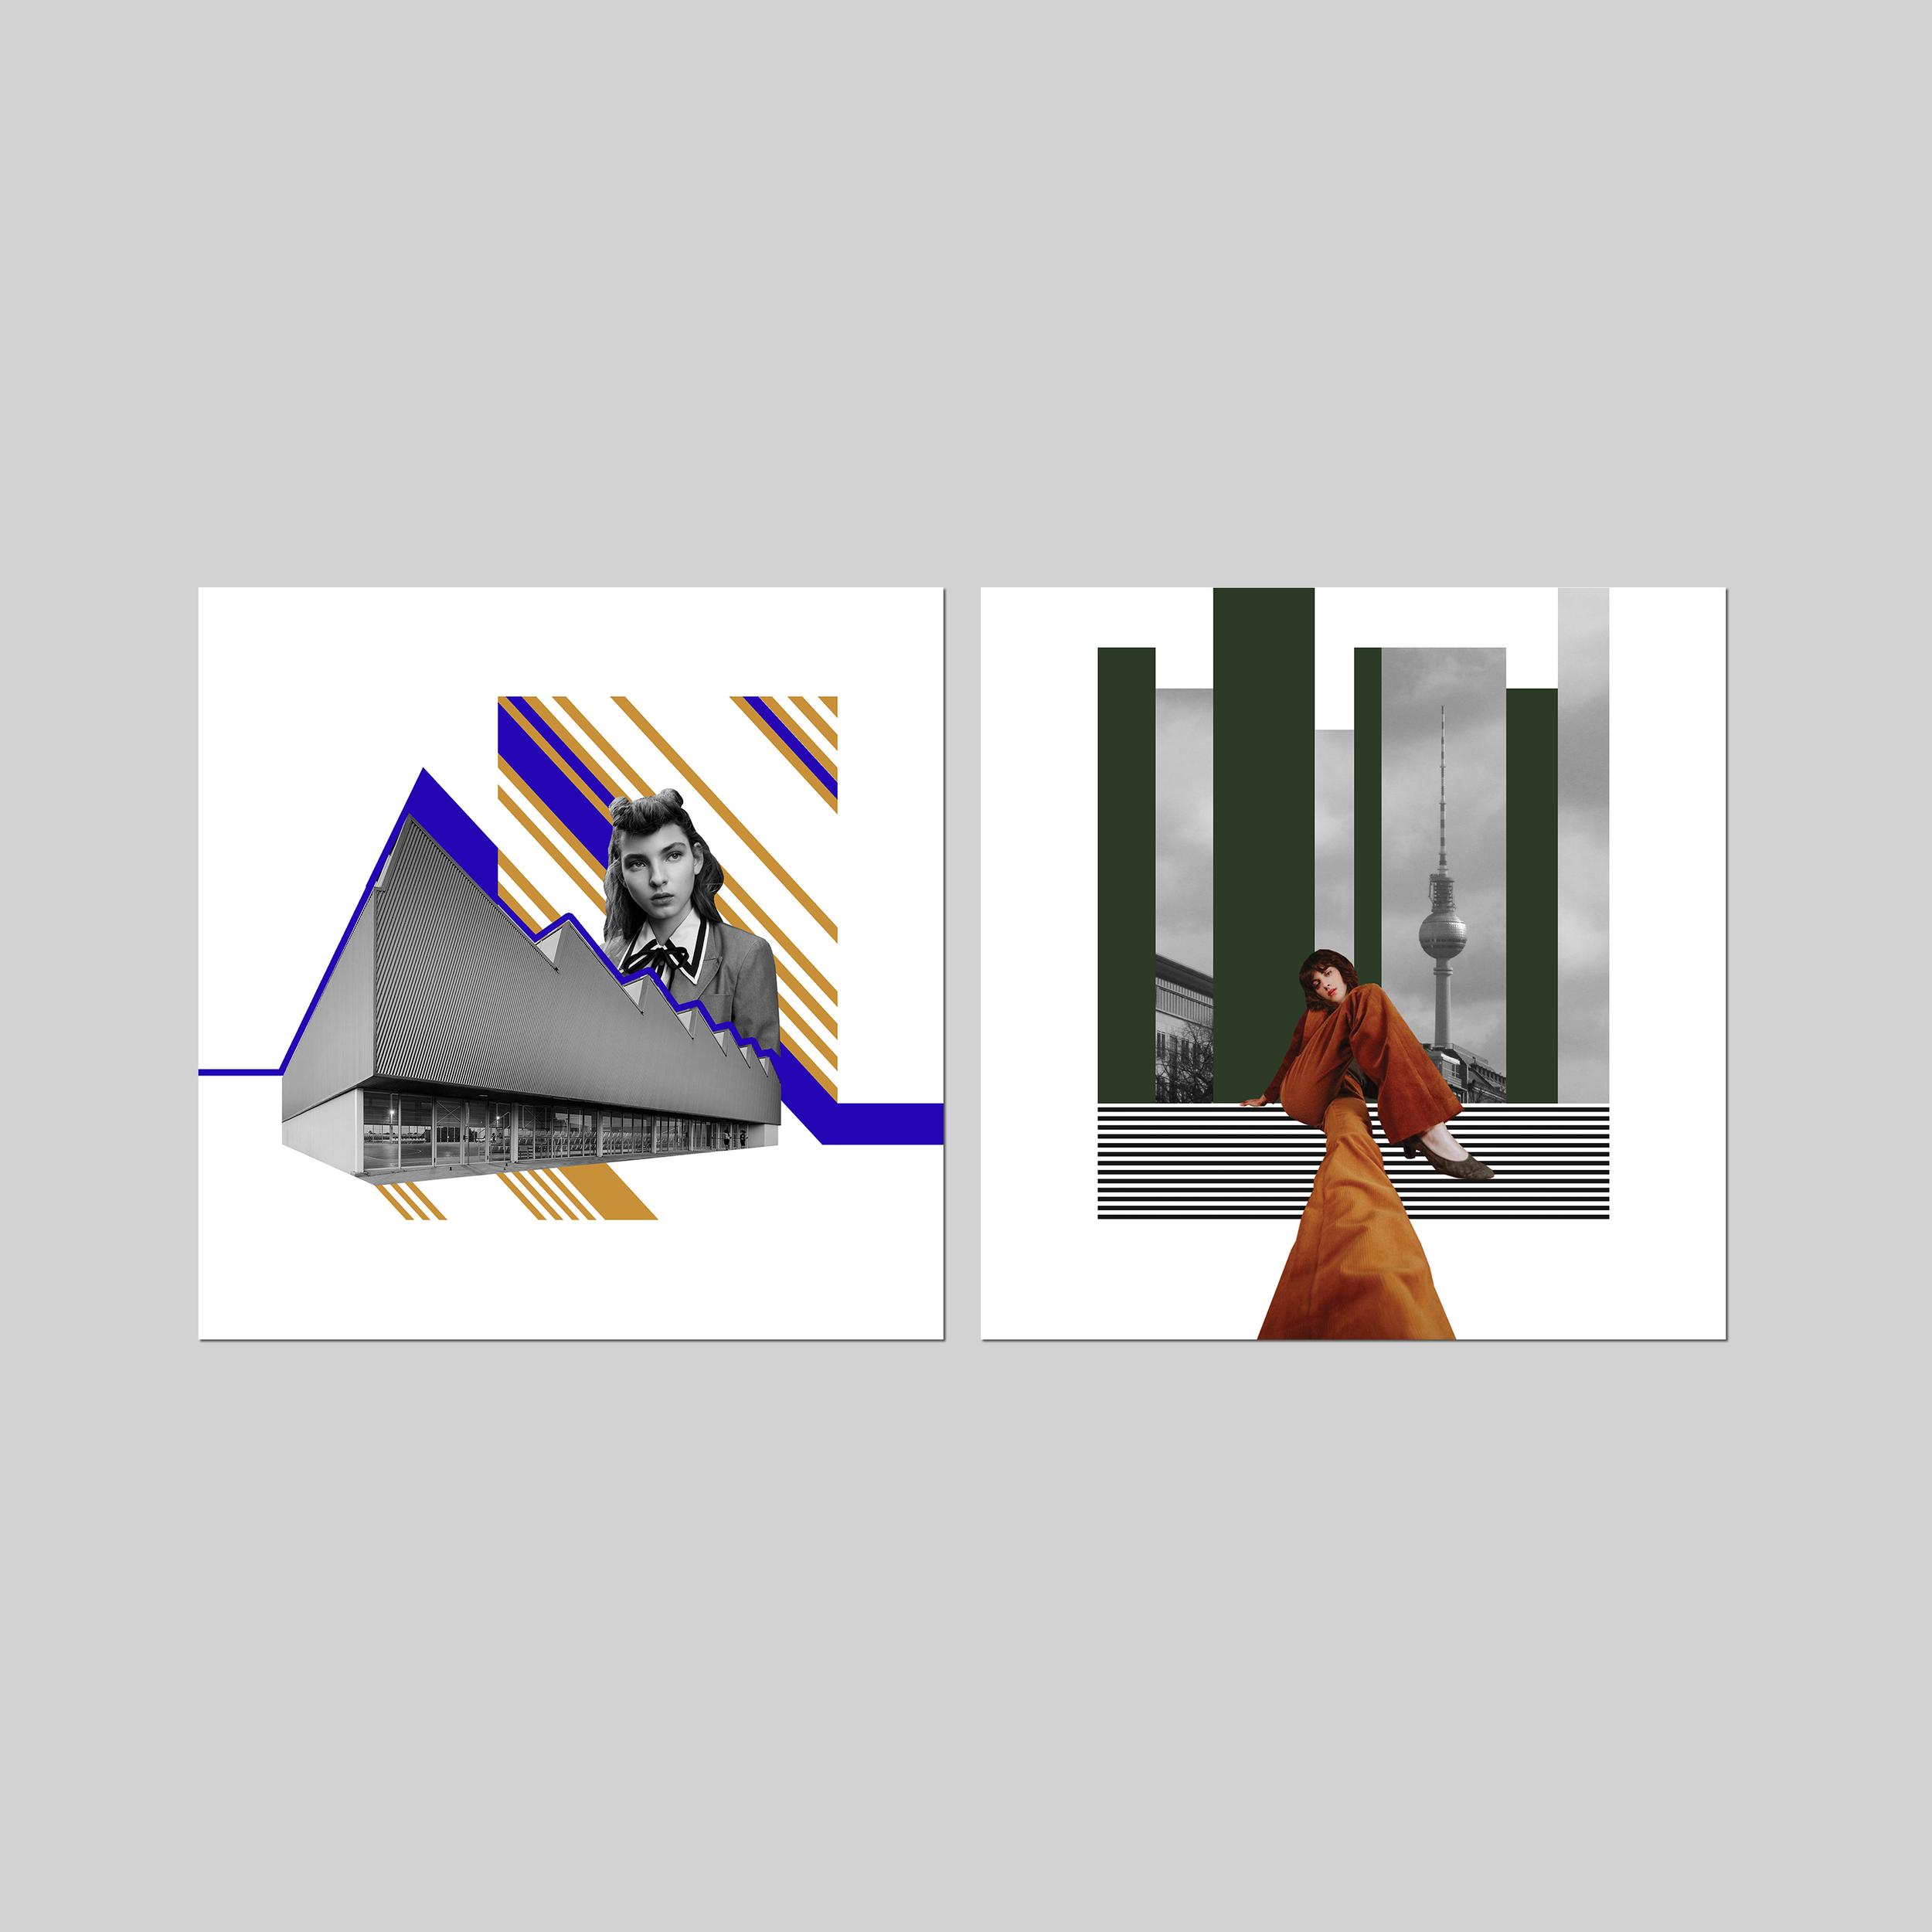 Shop - Prints - Mockup.png